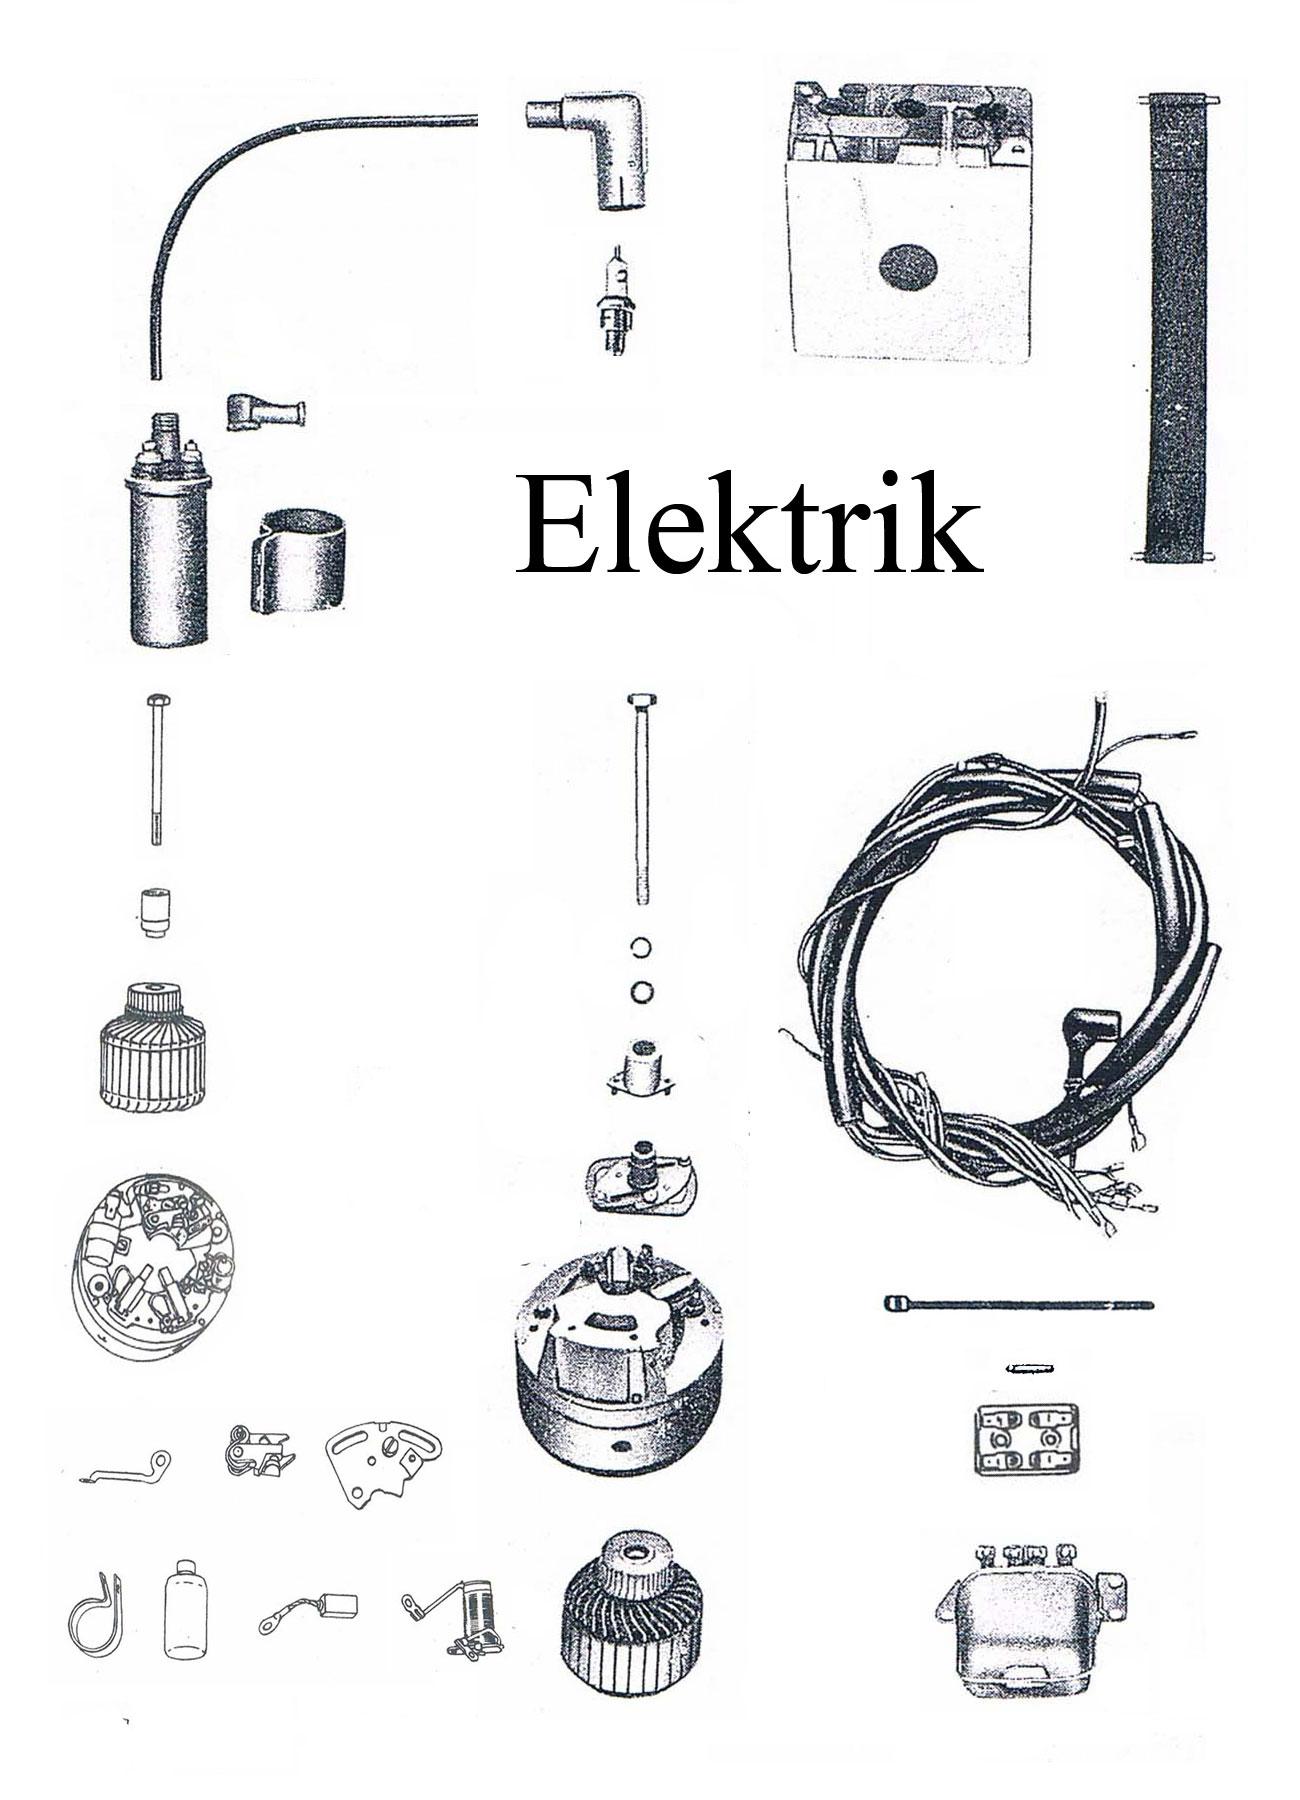 MZ ES 175/2-250/2 Ersatzteileliste Batterie Regler Kabelbaum Zündspule Lichtmaschine